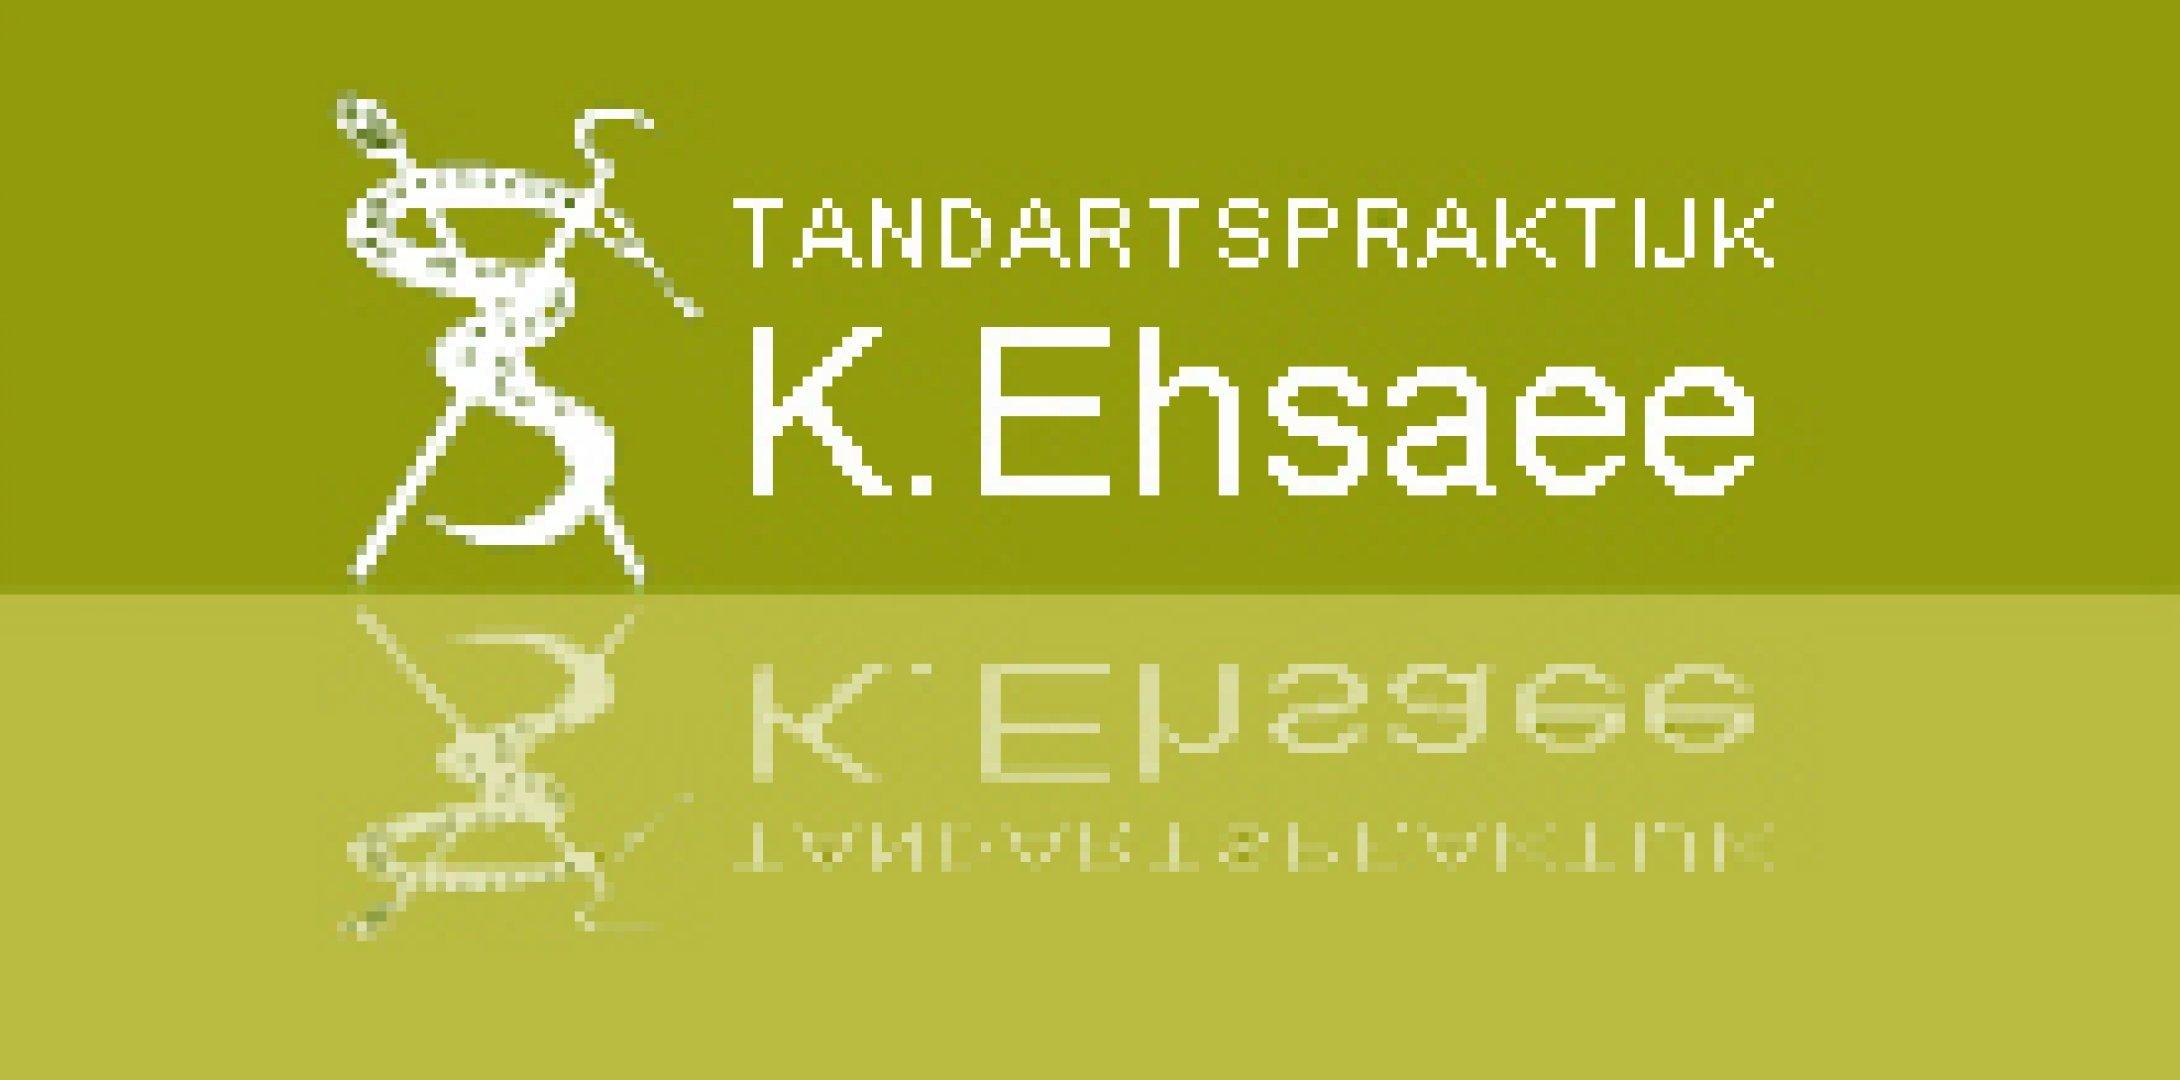 Tandartspraktijk Ehsaee